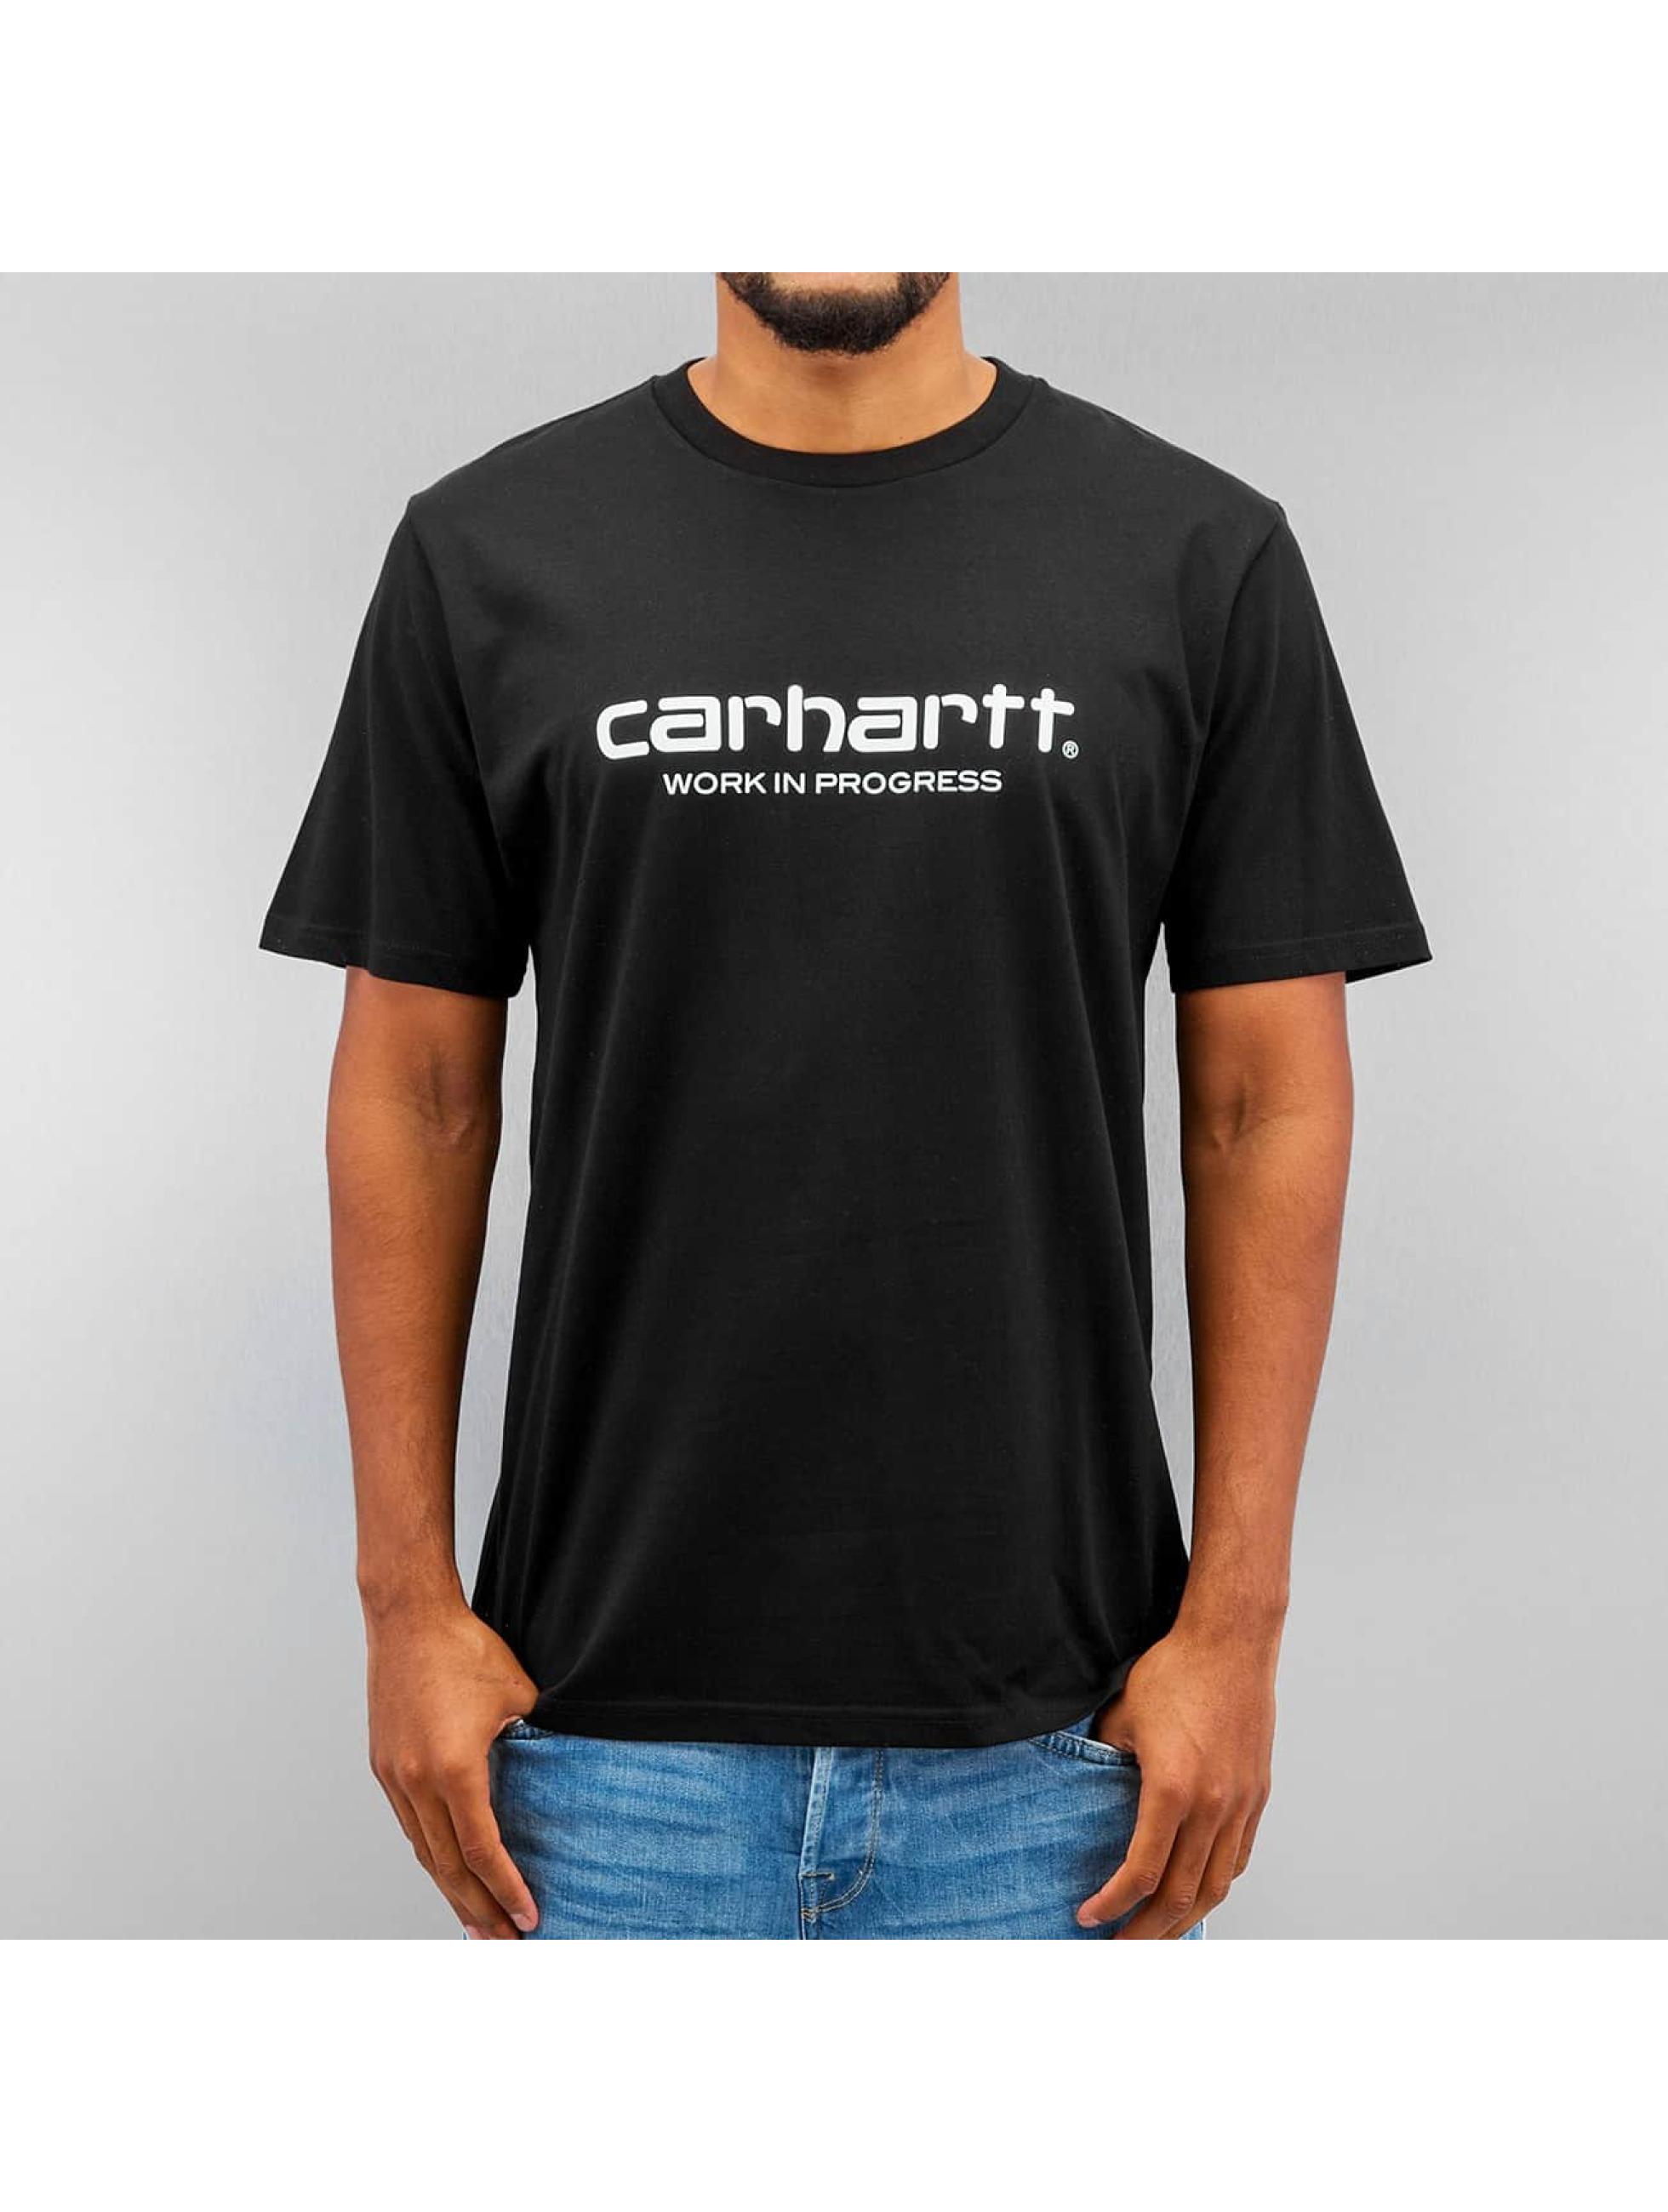 Carhartt WIP Футболка S/S Wip Script черный